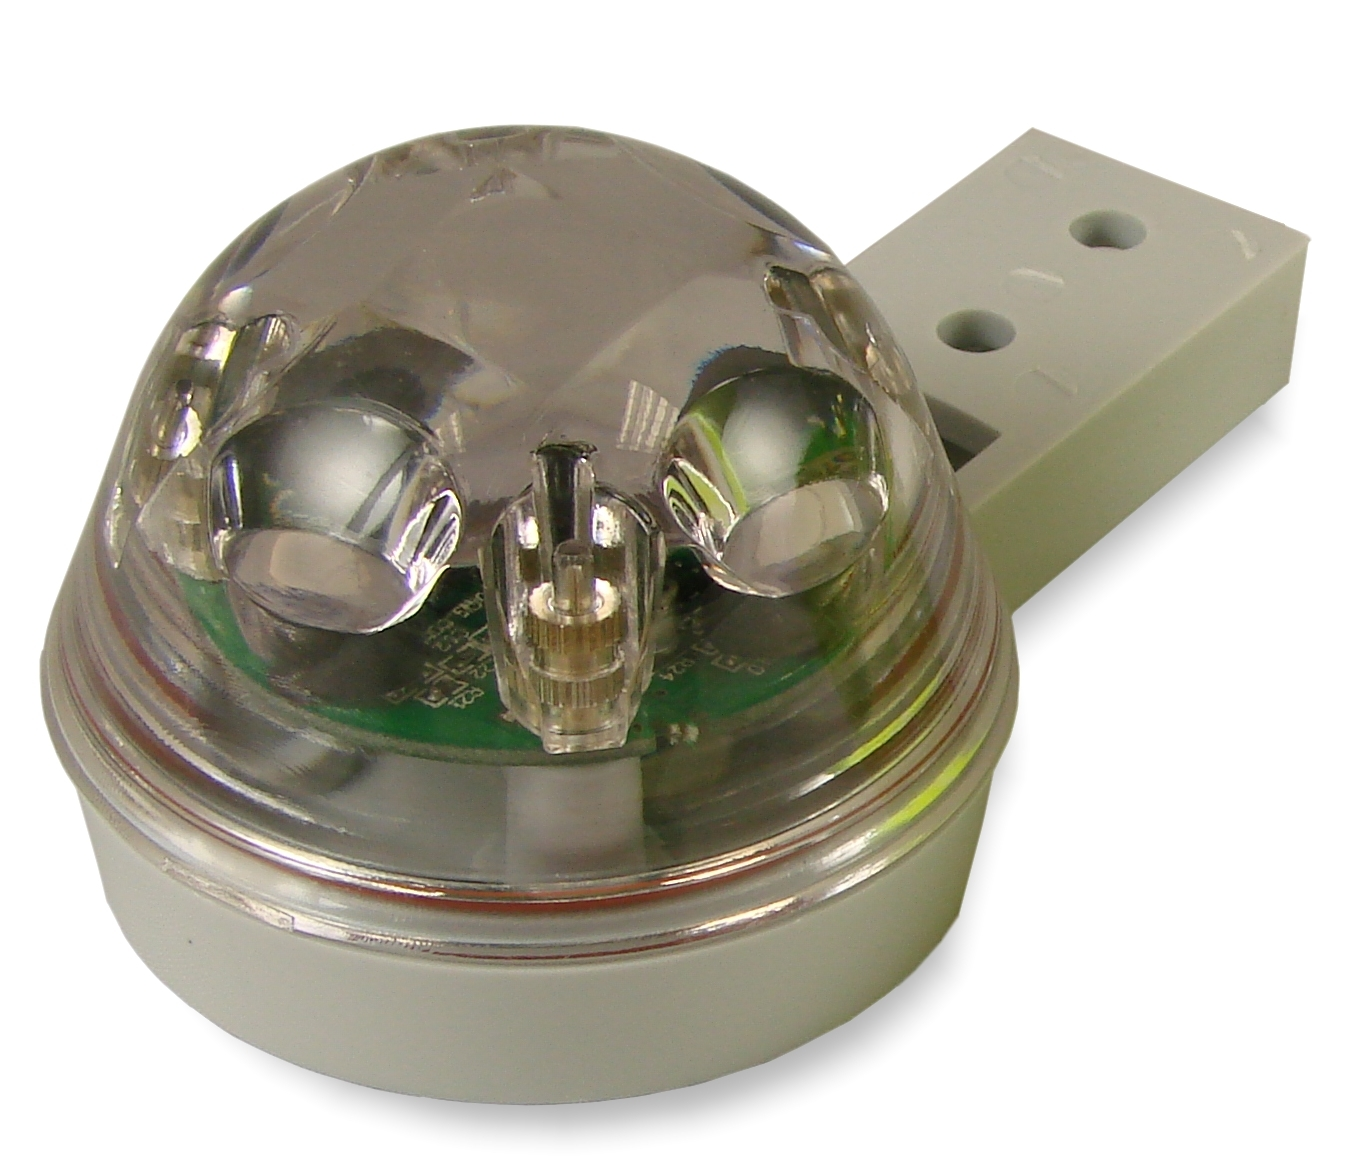 RG11 rain detector test